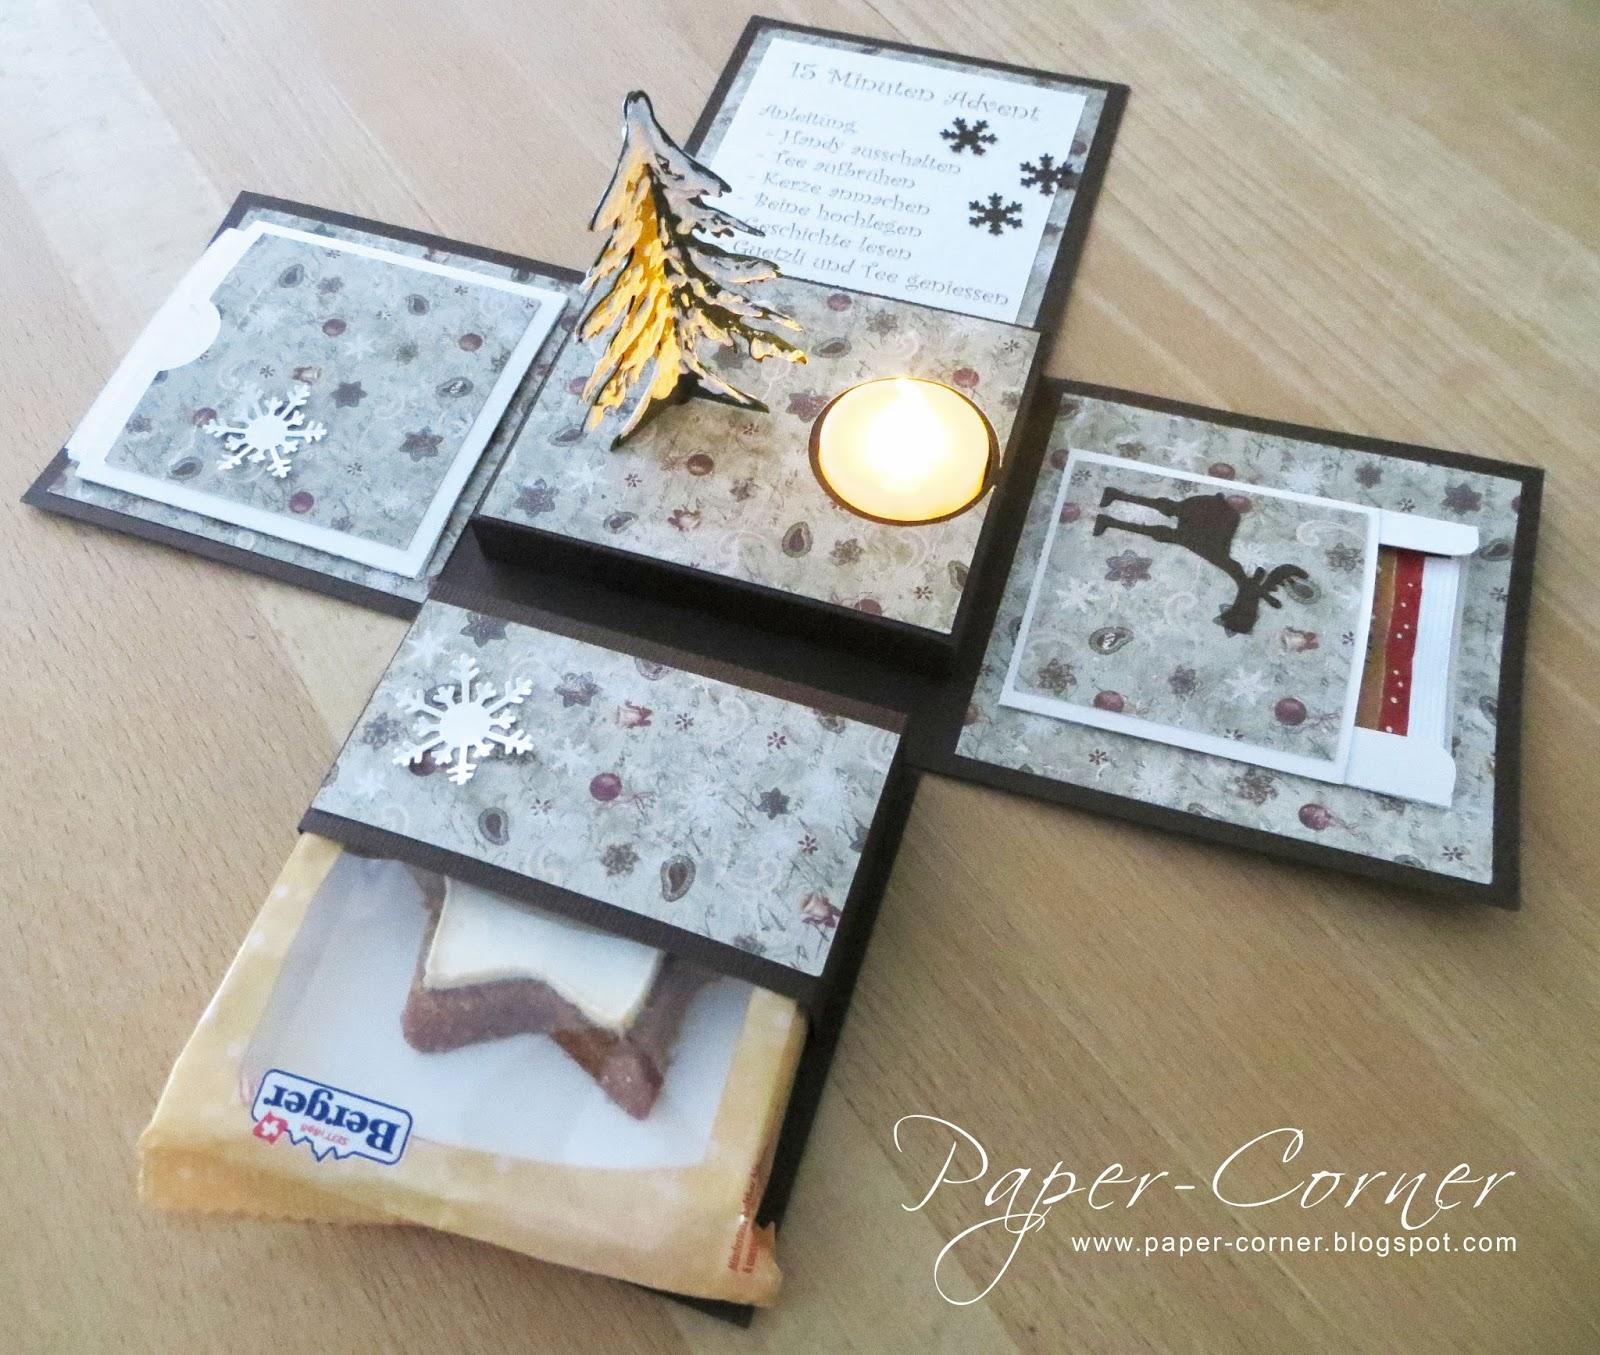 paper corner 15 minuten advent. Black Bedroom Furniture Sets. Home Design Ideas